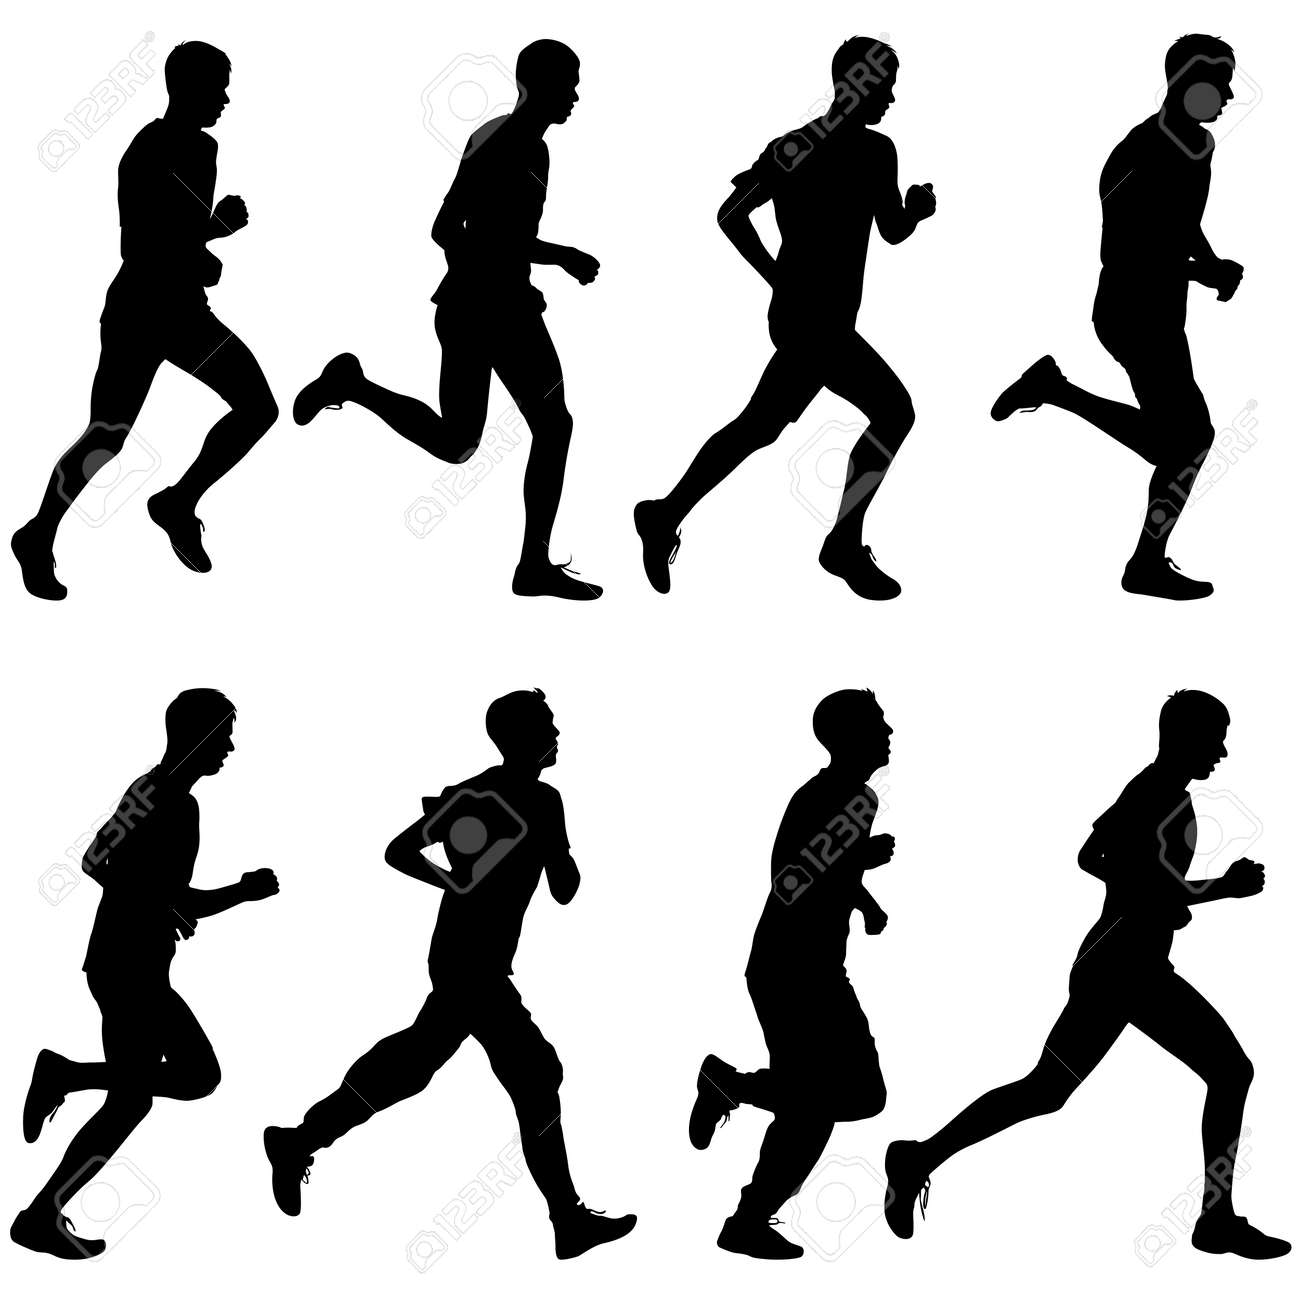 Set of silhouettes. Runners on sprint, men. vector illustration. - 36778243